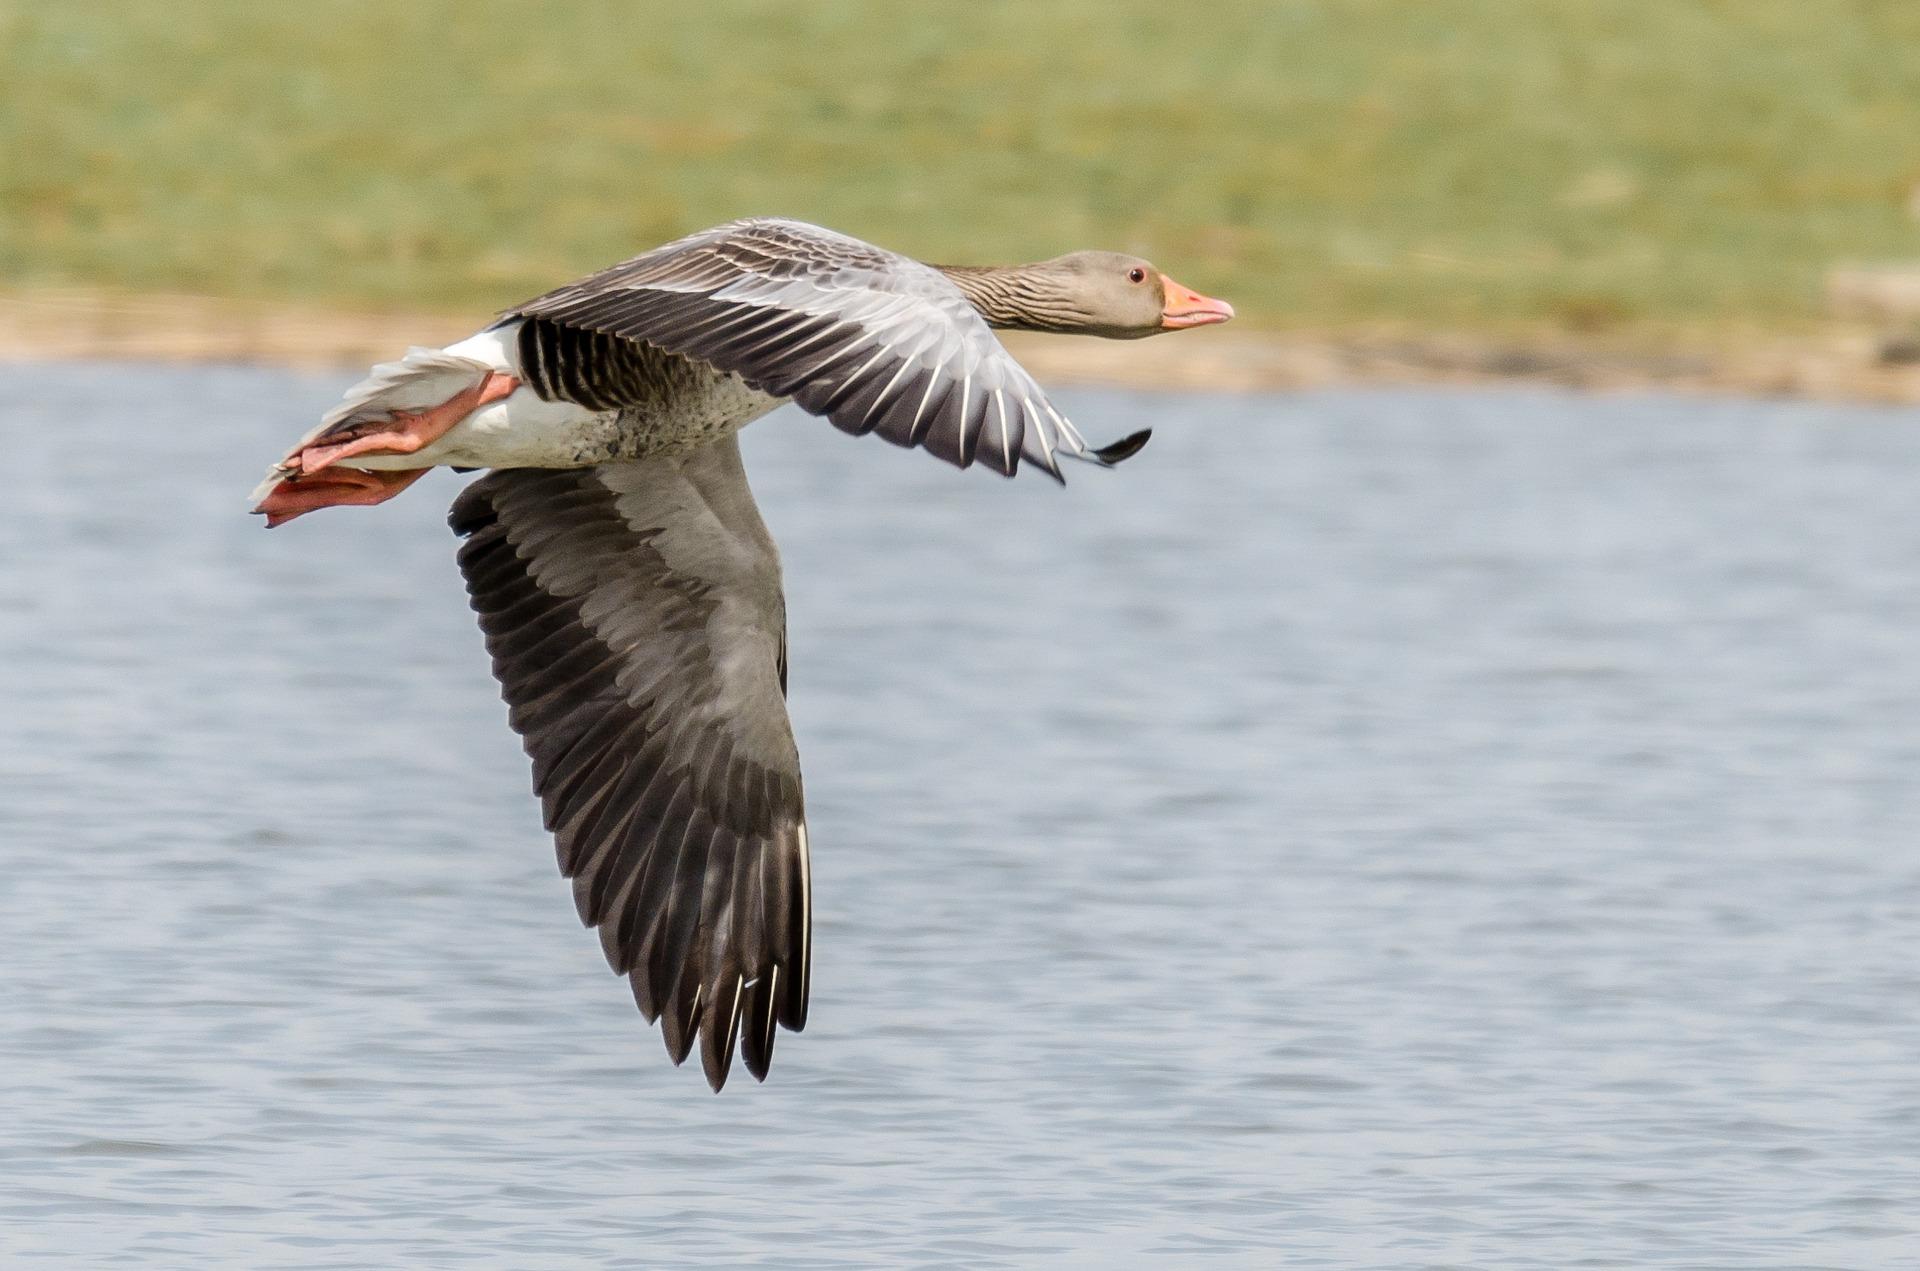 greylag-goose-1580869_1920.jpg